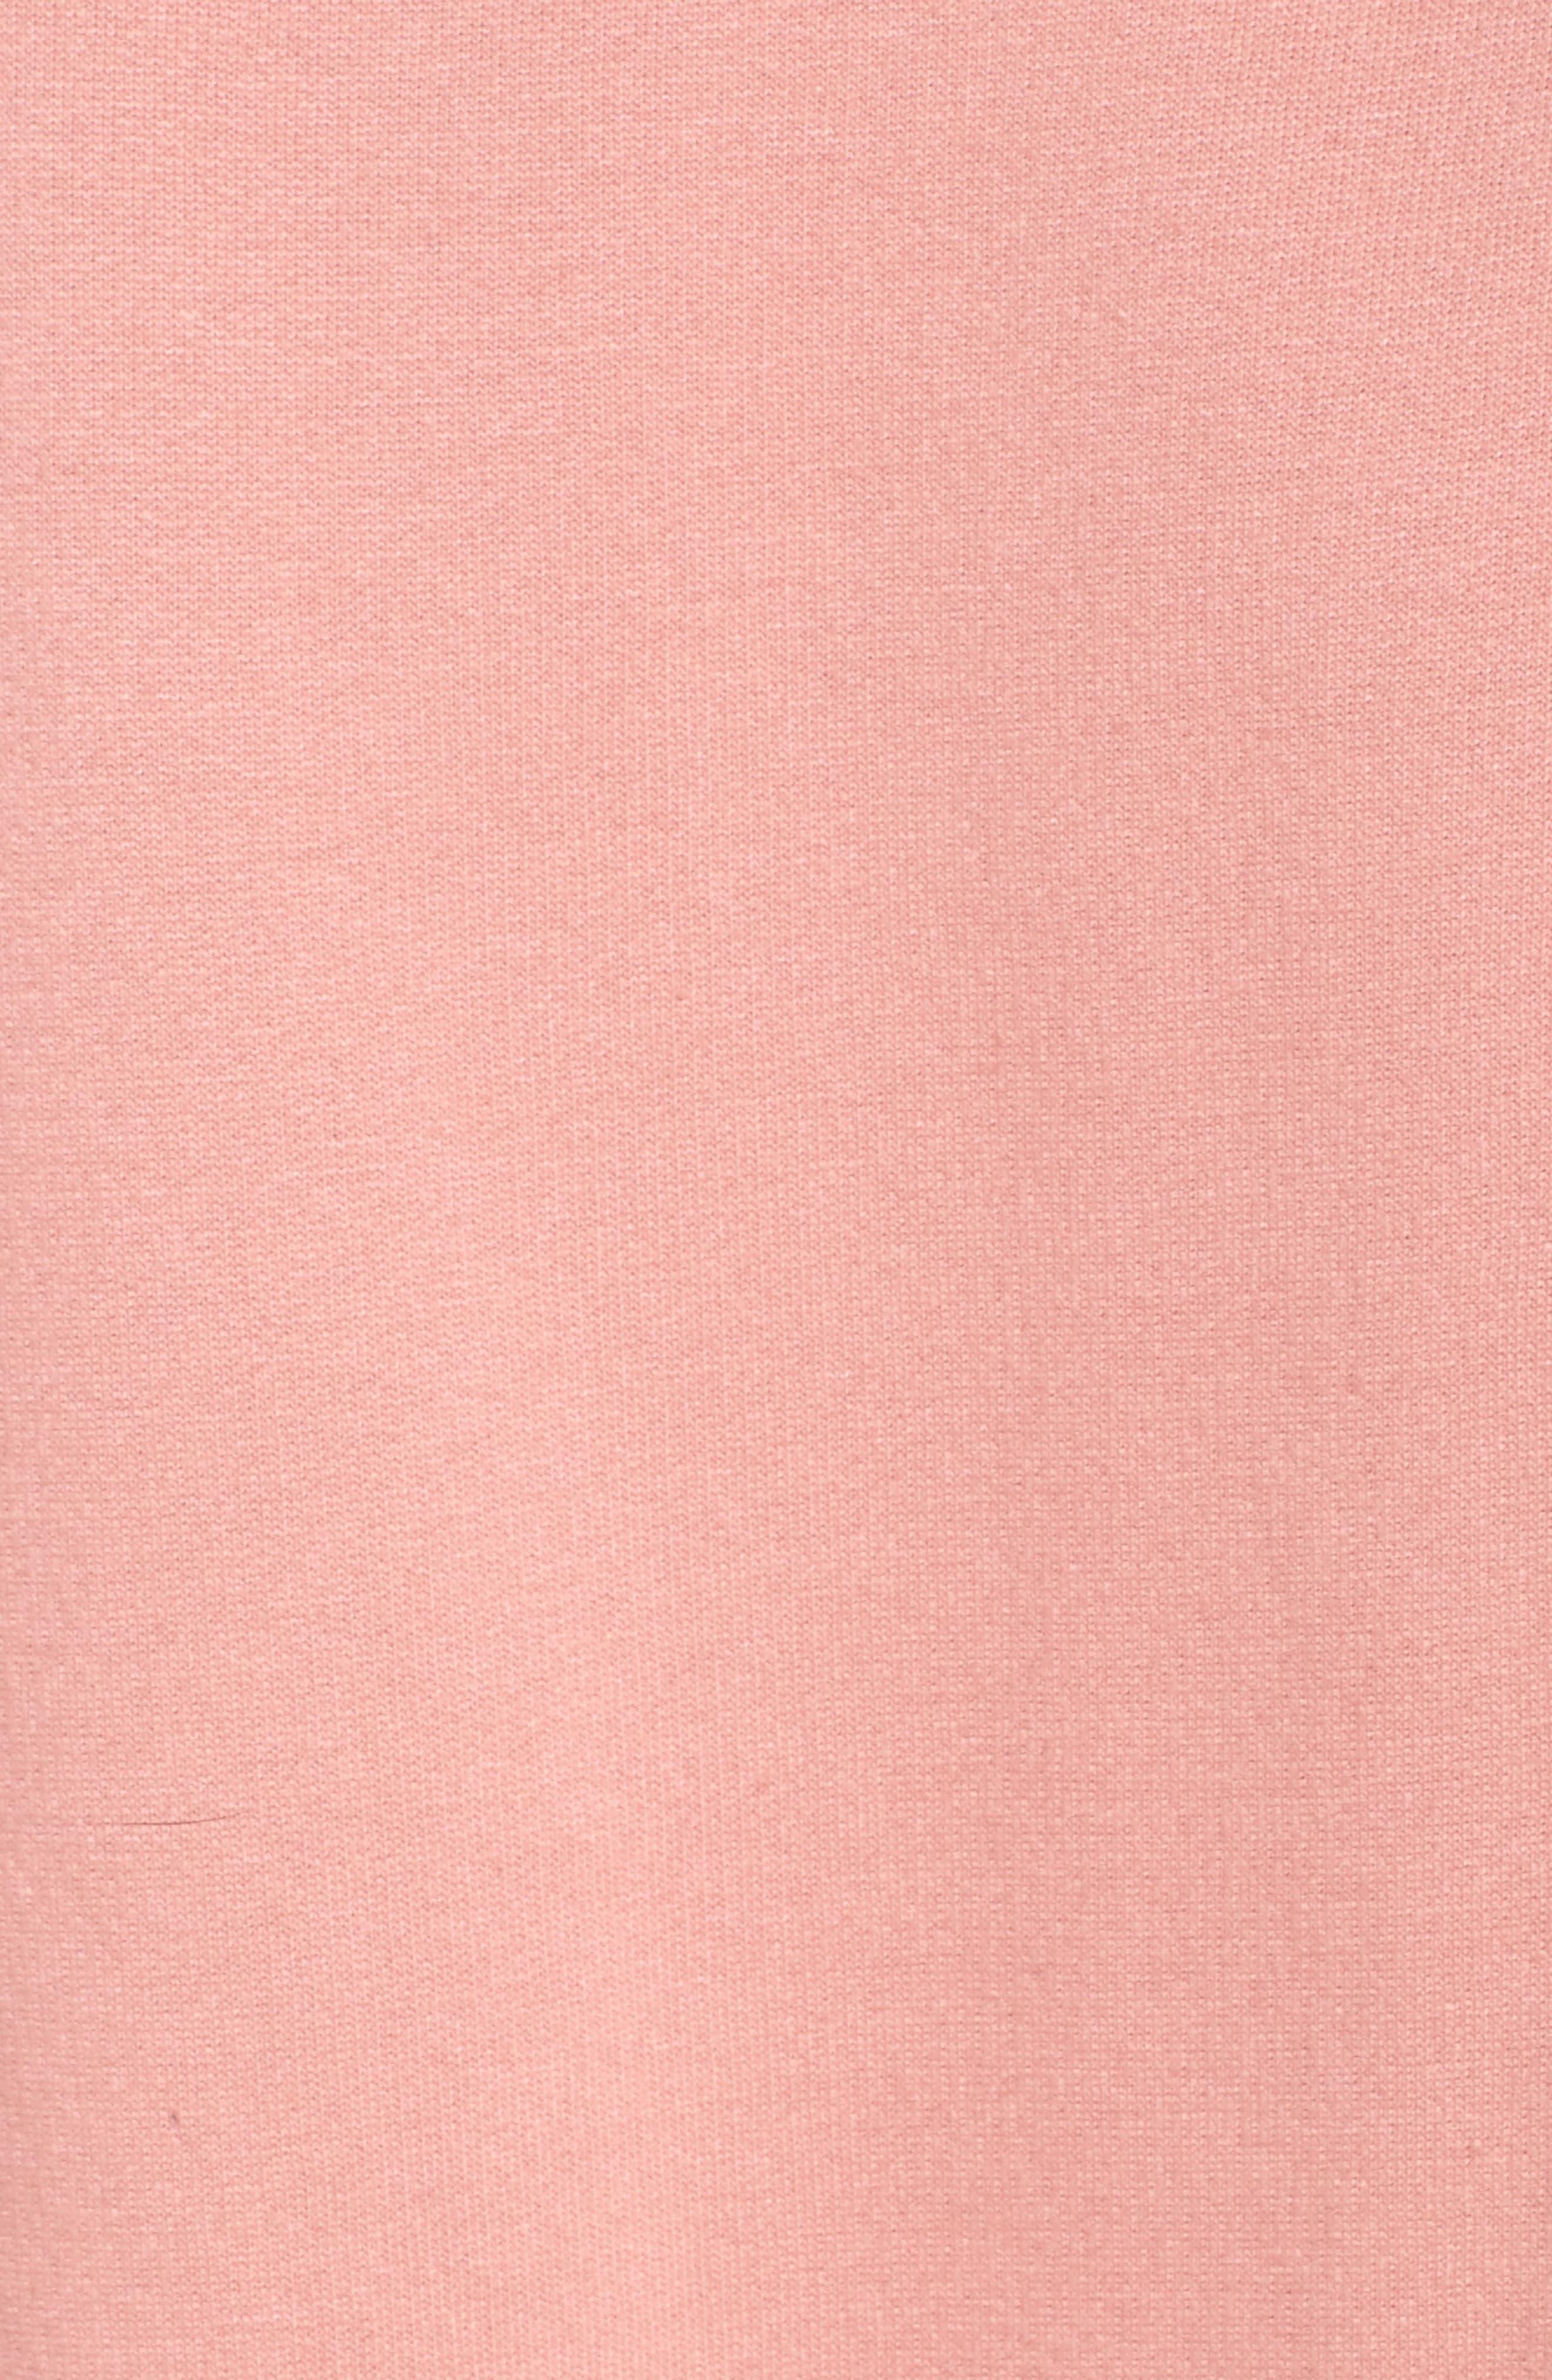 Blonde Crewneck Sweatshirt,                             Alternate thumbnail 5, color,